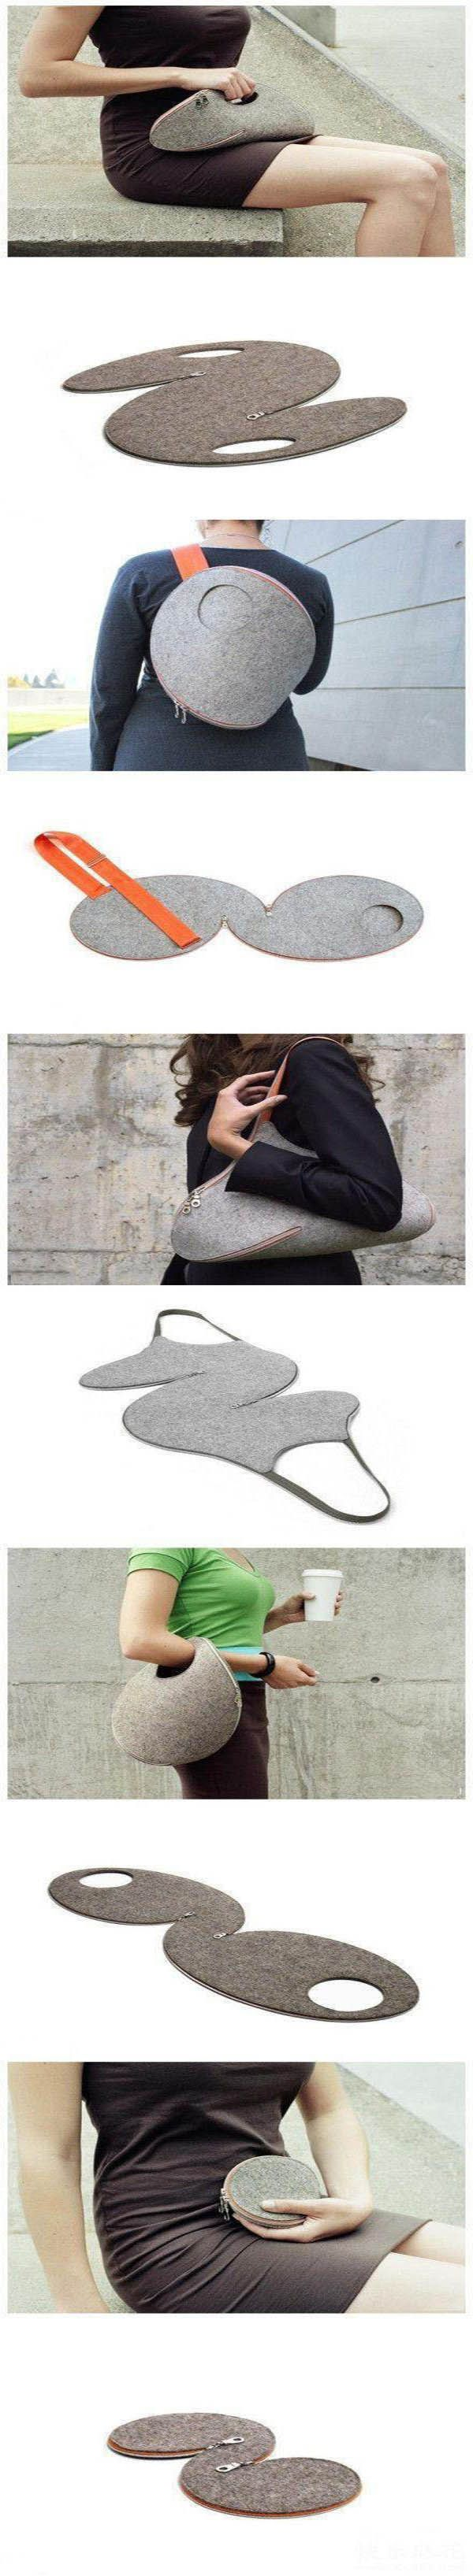 Diy Handbag | DIY Crafts Tutorials